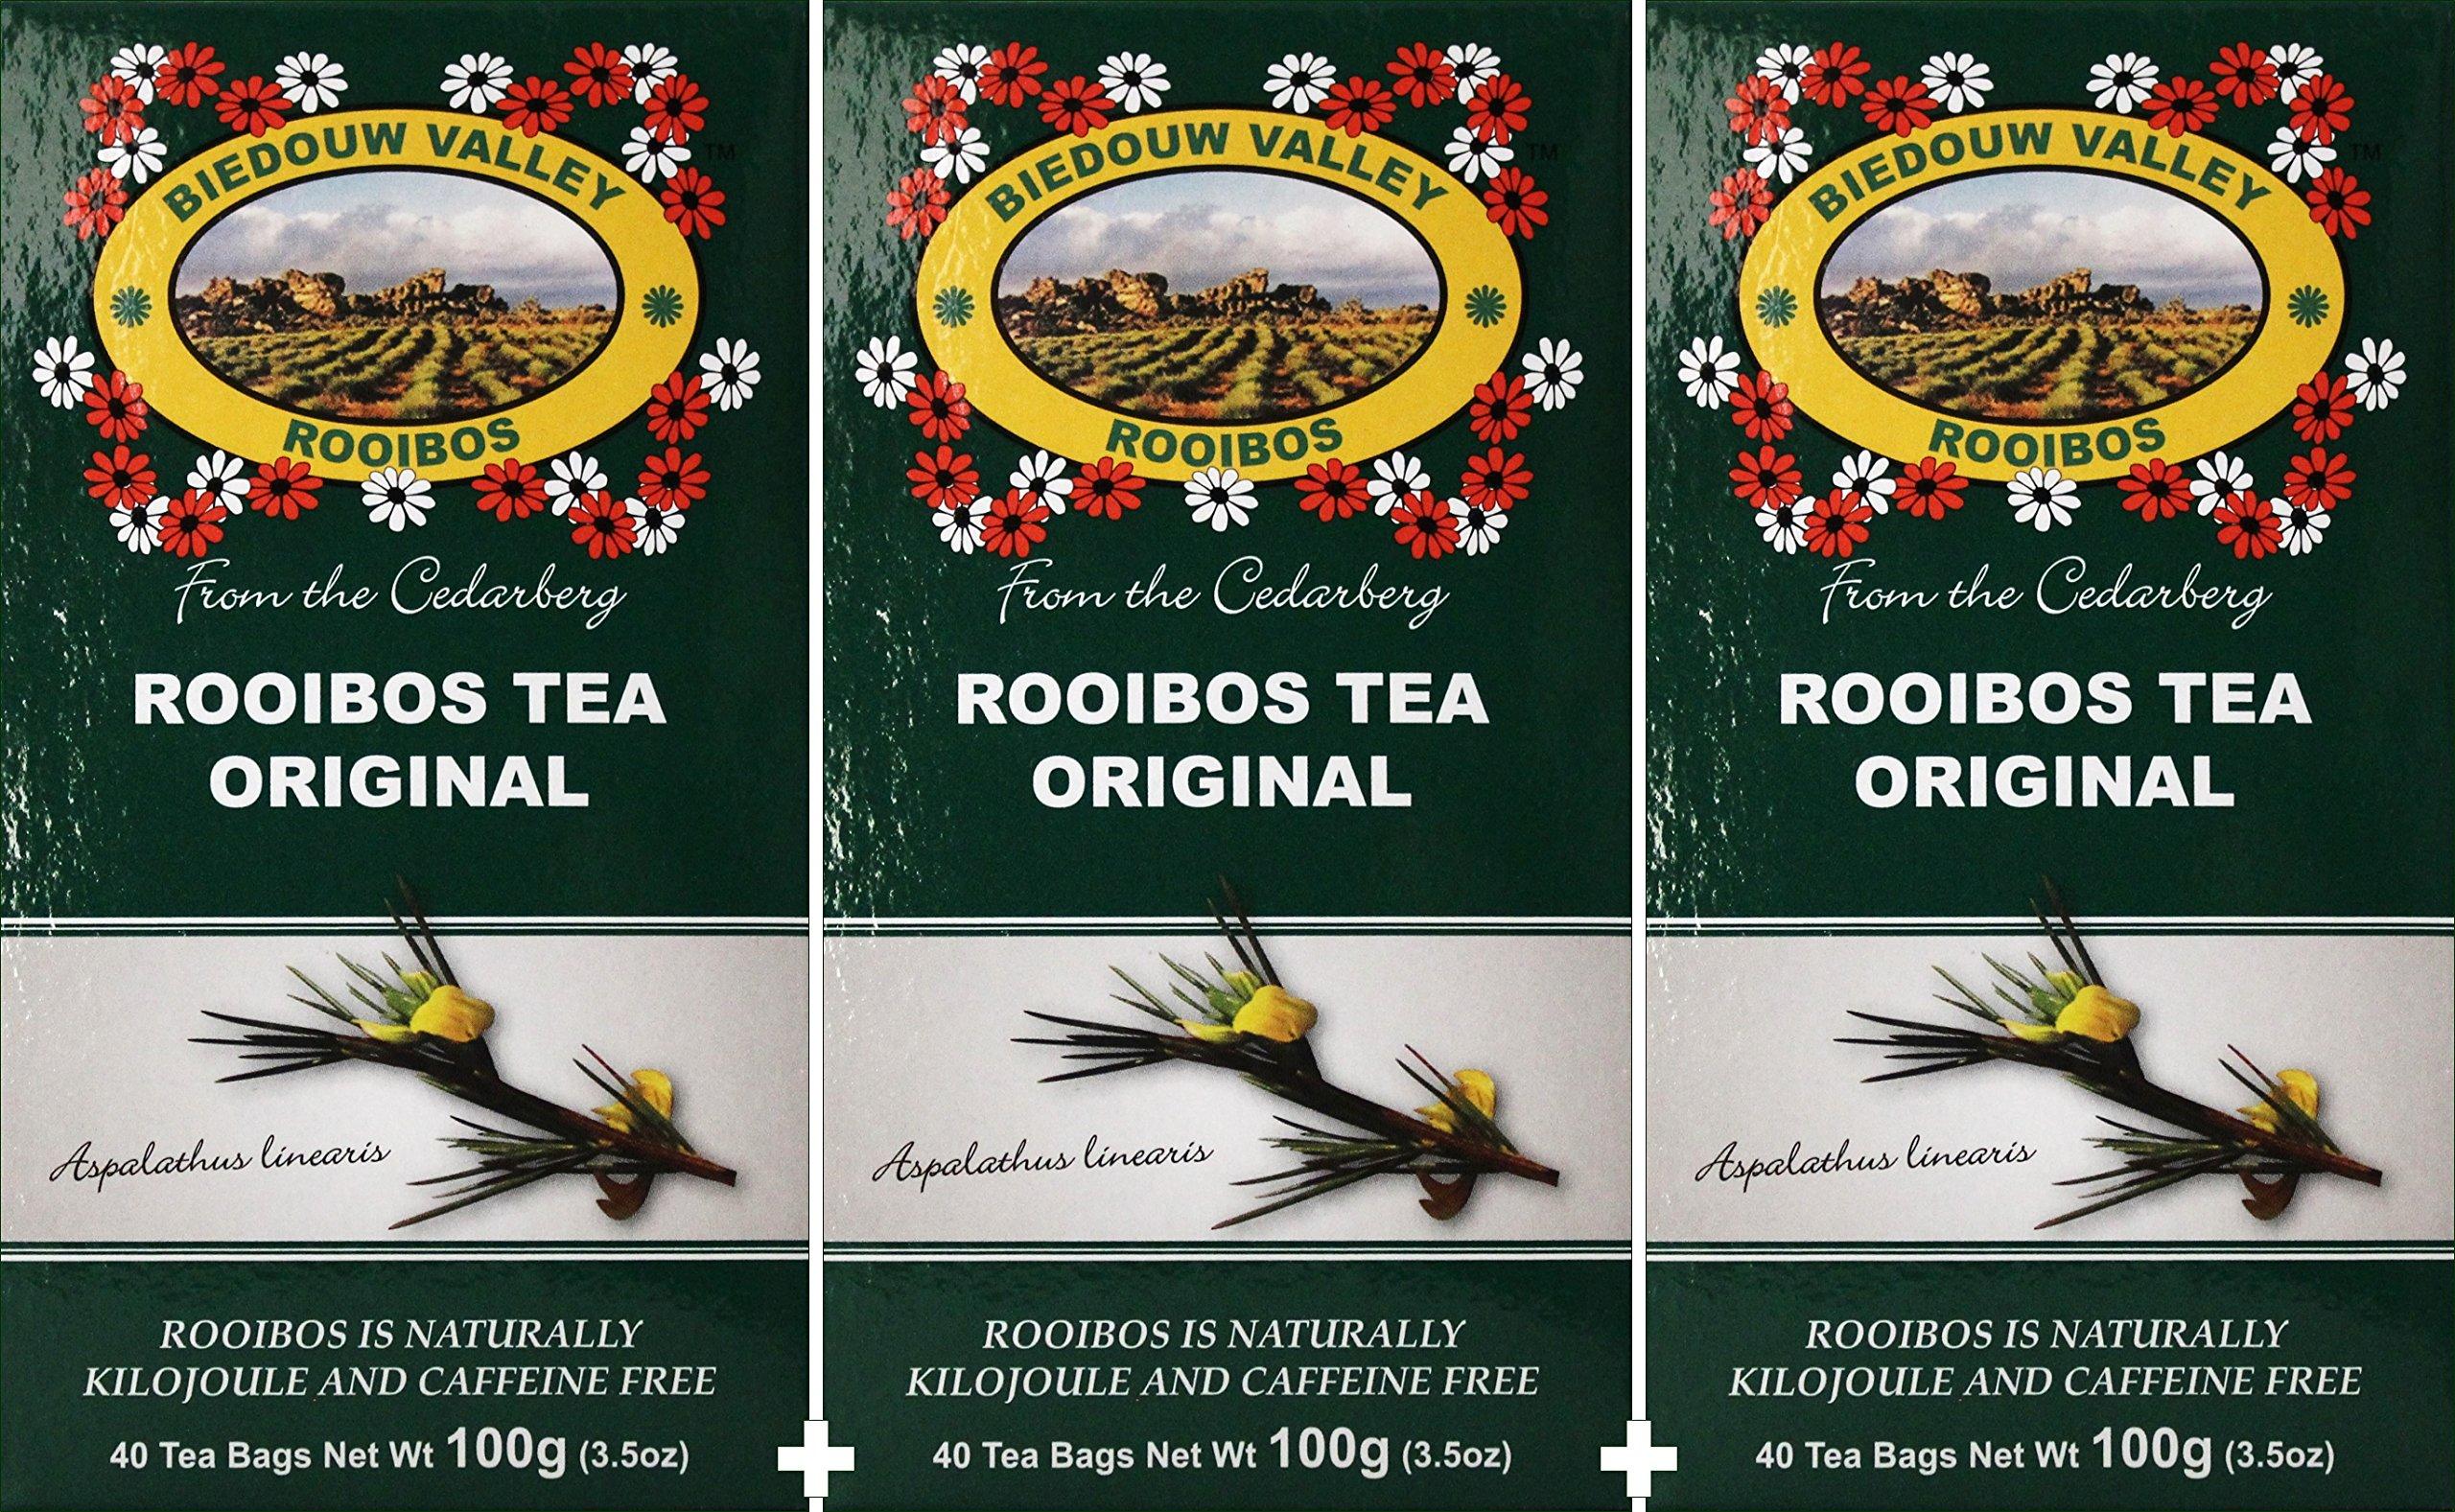 Rooibos Tea: 100% Natural Original South African (120 Bag Count 10.5oz) Red Bush Healthy Herbal Tea - Caffeine Free, Calorie Free, Antioxidant & Mineral Rich. Grown At High Altitude in Natural Habitat